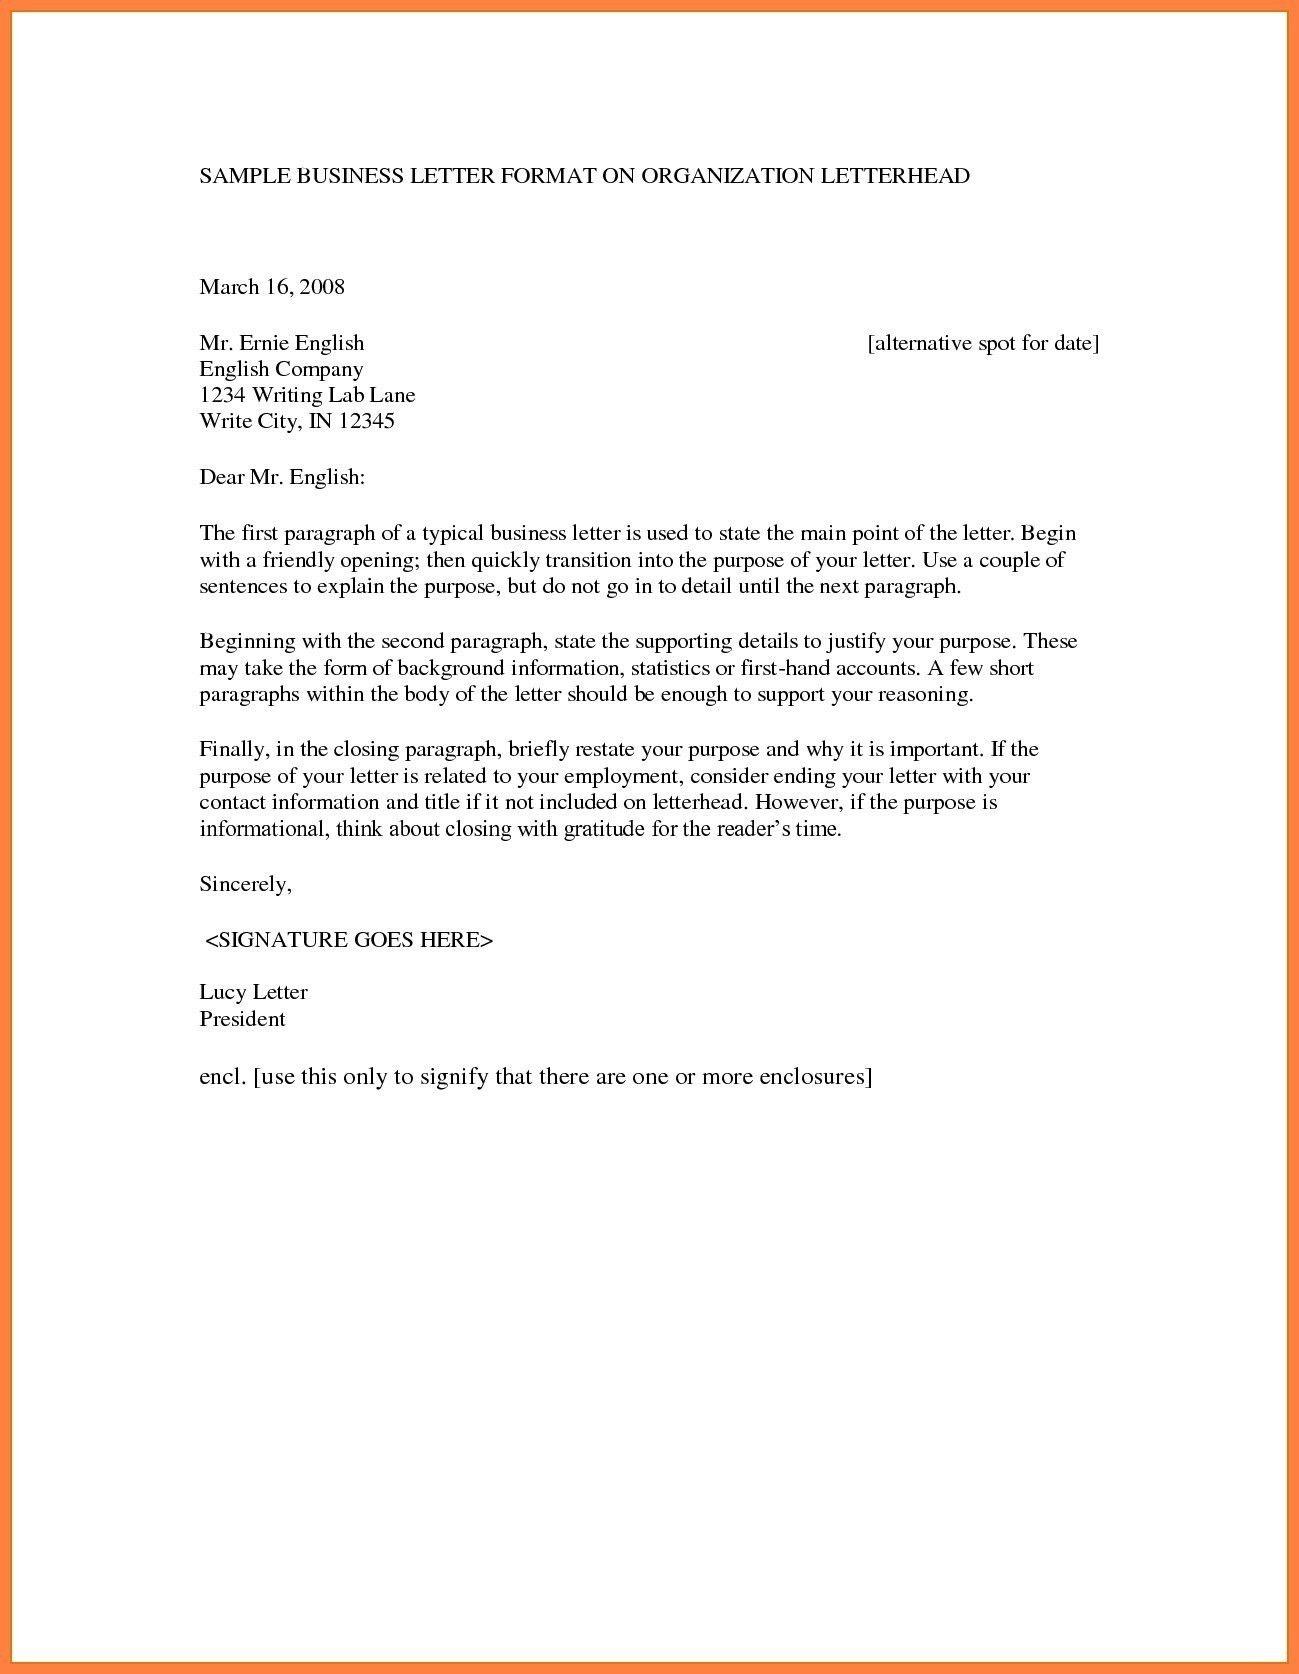 Download Fresh Letterhead Text Sample Pdf At Https Gprime Us